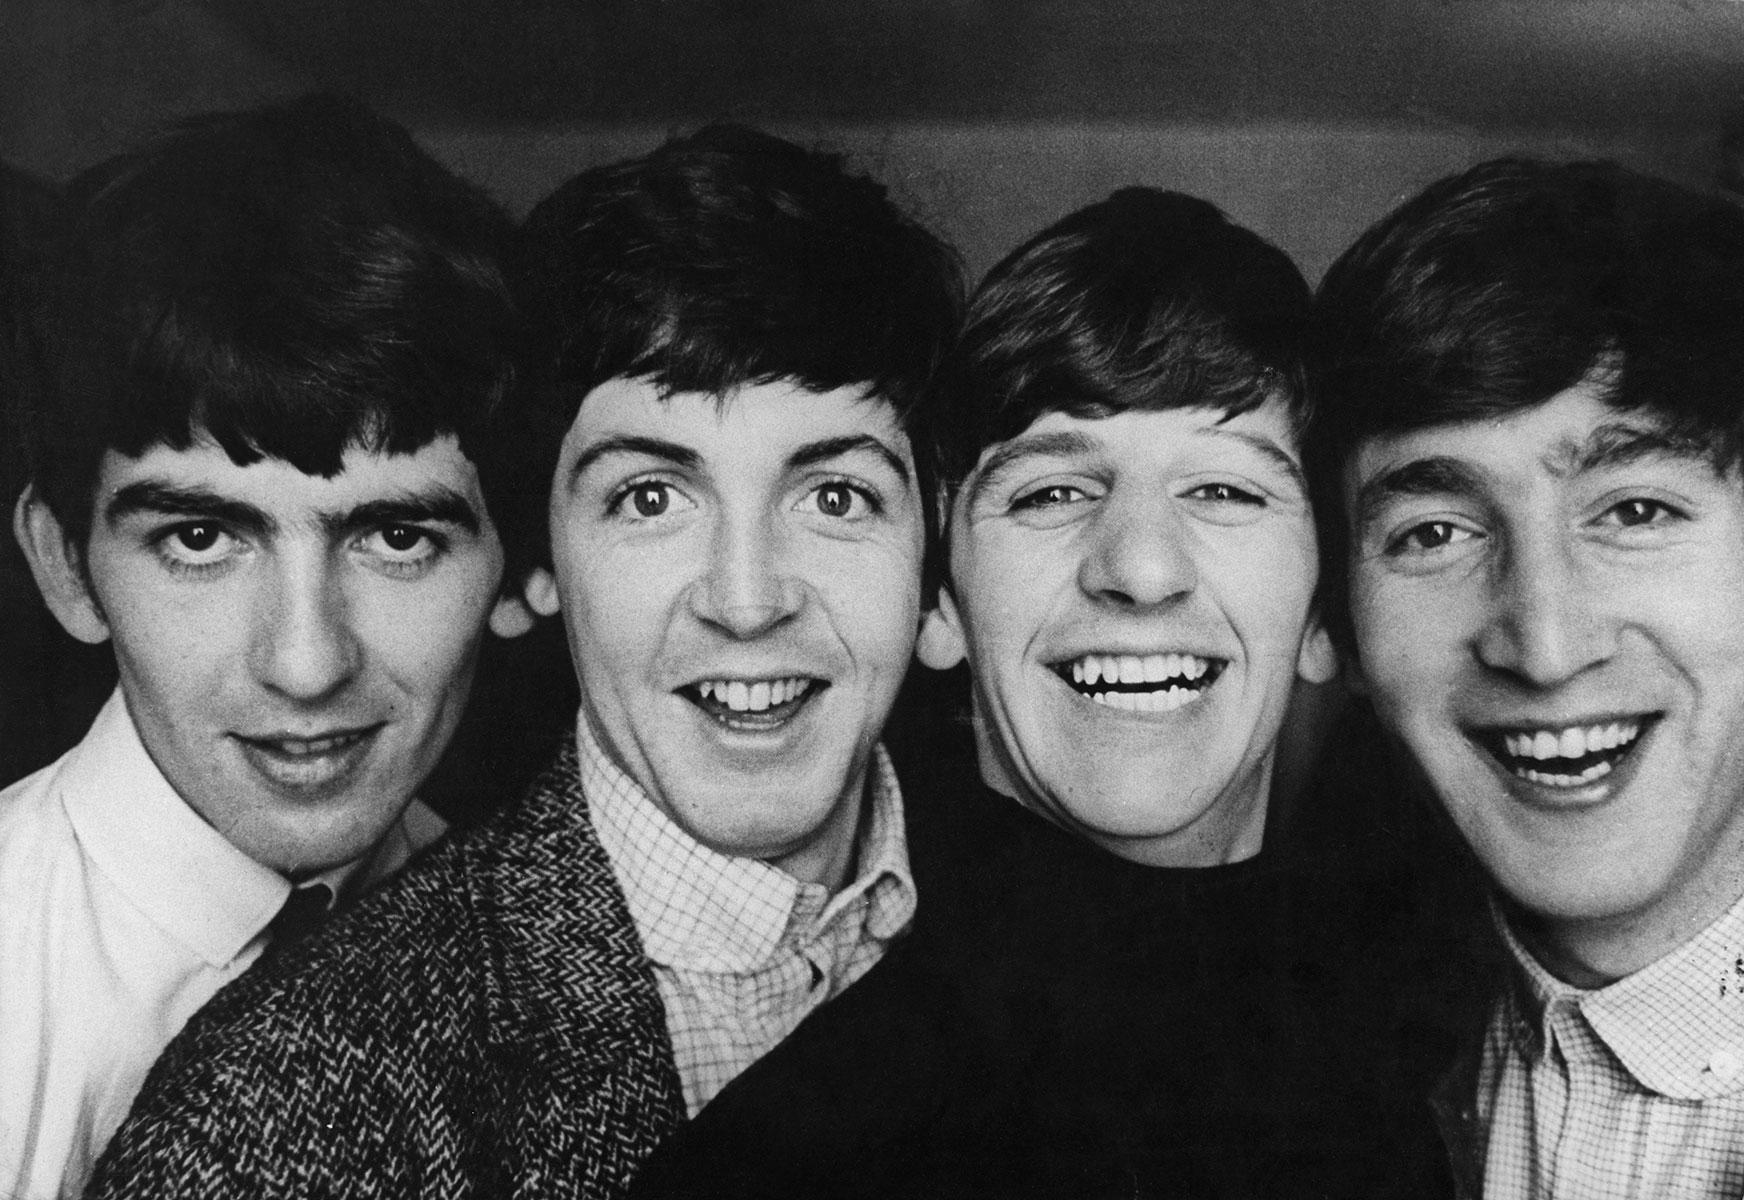 The Beatles Hd Wallpapers 7wallpapersnet